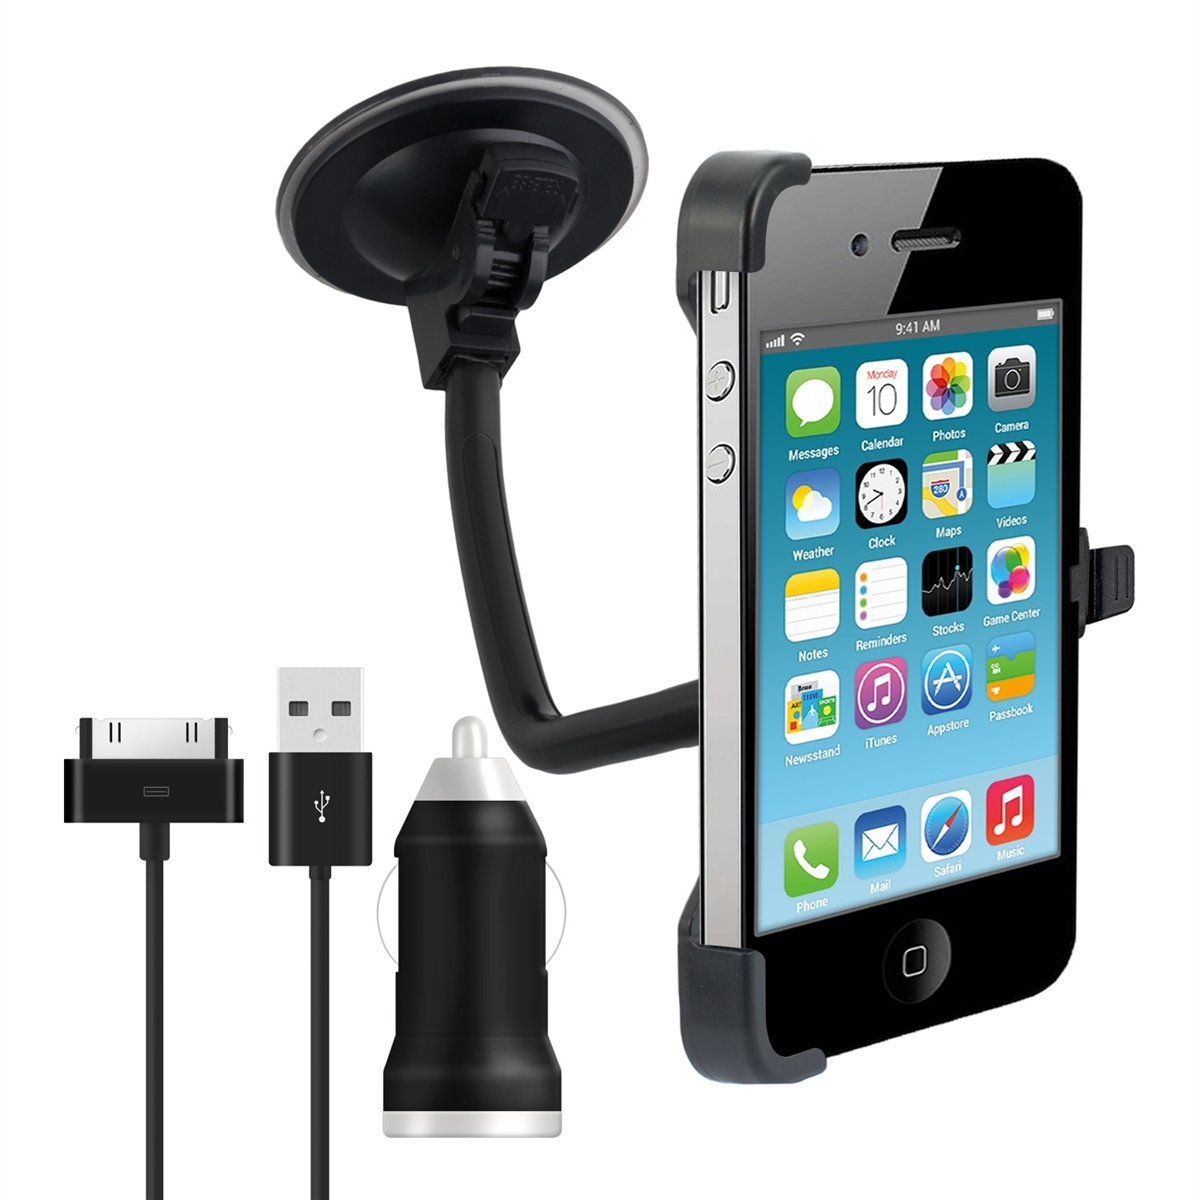 kwmobile auto halterung f r apple iphone 4 4s ladeger t flexibel kfz halter ebay. Black Bedroom Furniture Sets. Home Design Ideas